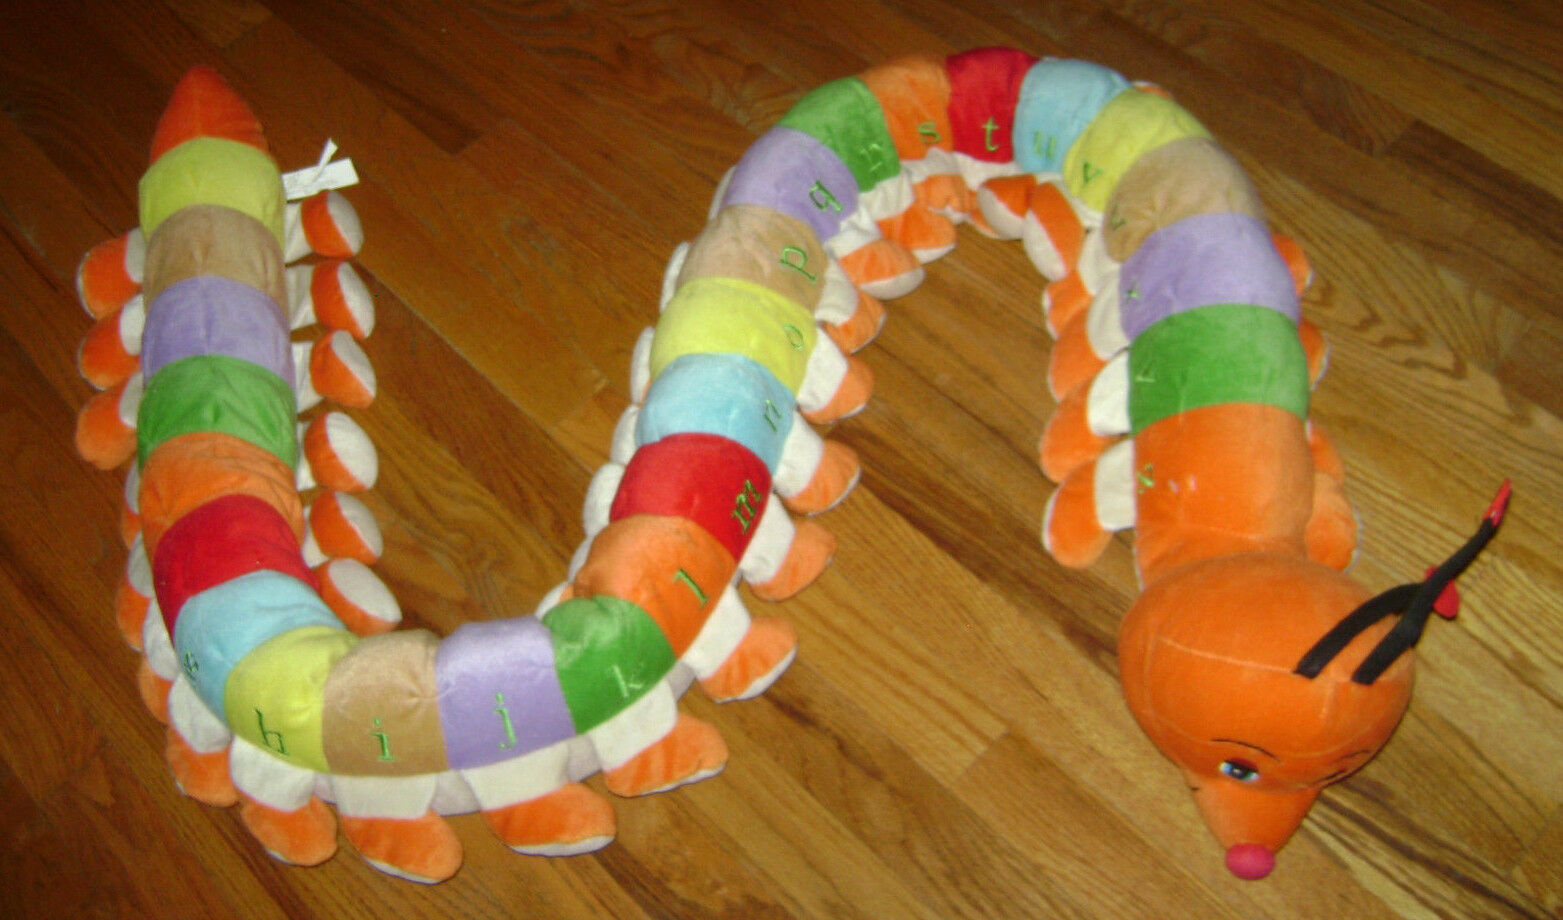 GIANT 80  Long Plush Centipede Caterpillar ABC Alphabet Preschool Learning Toy